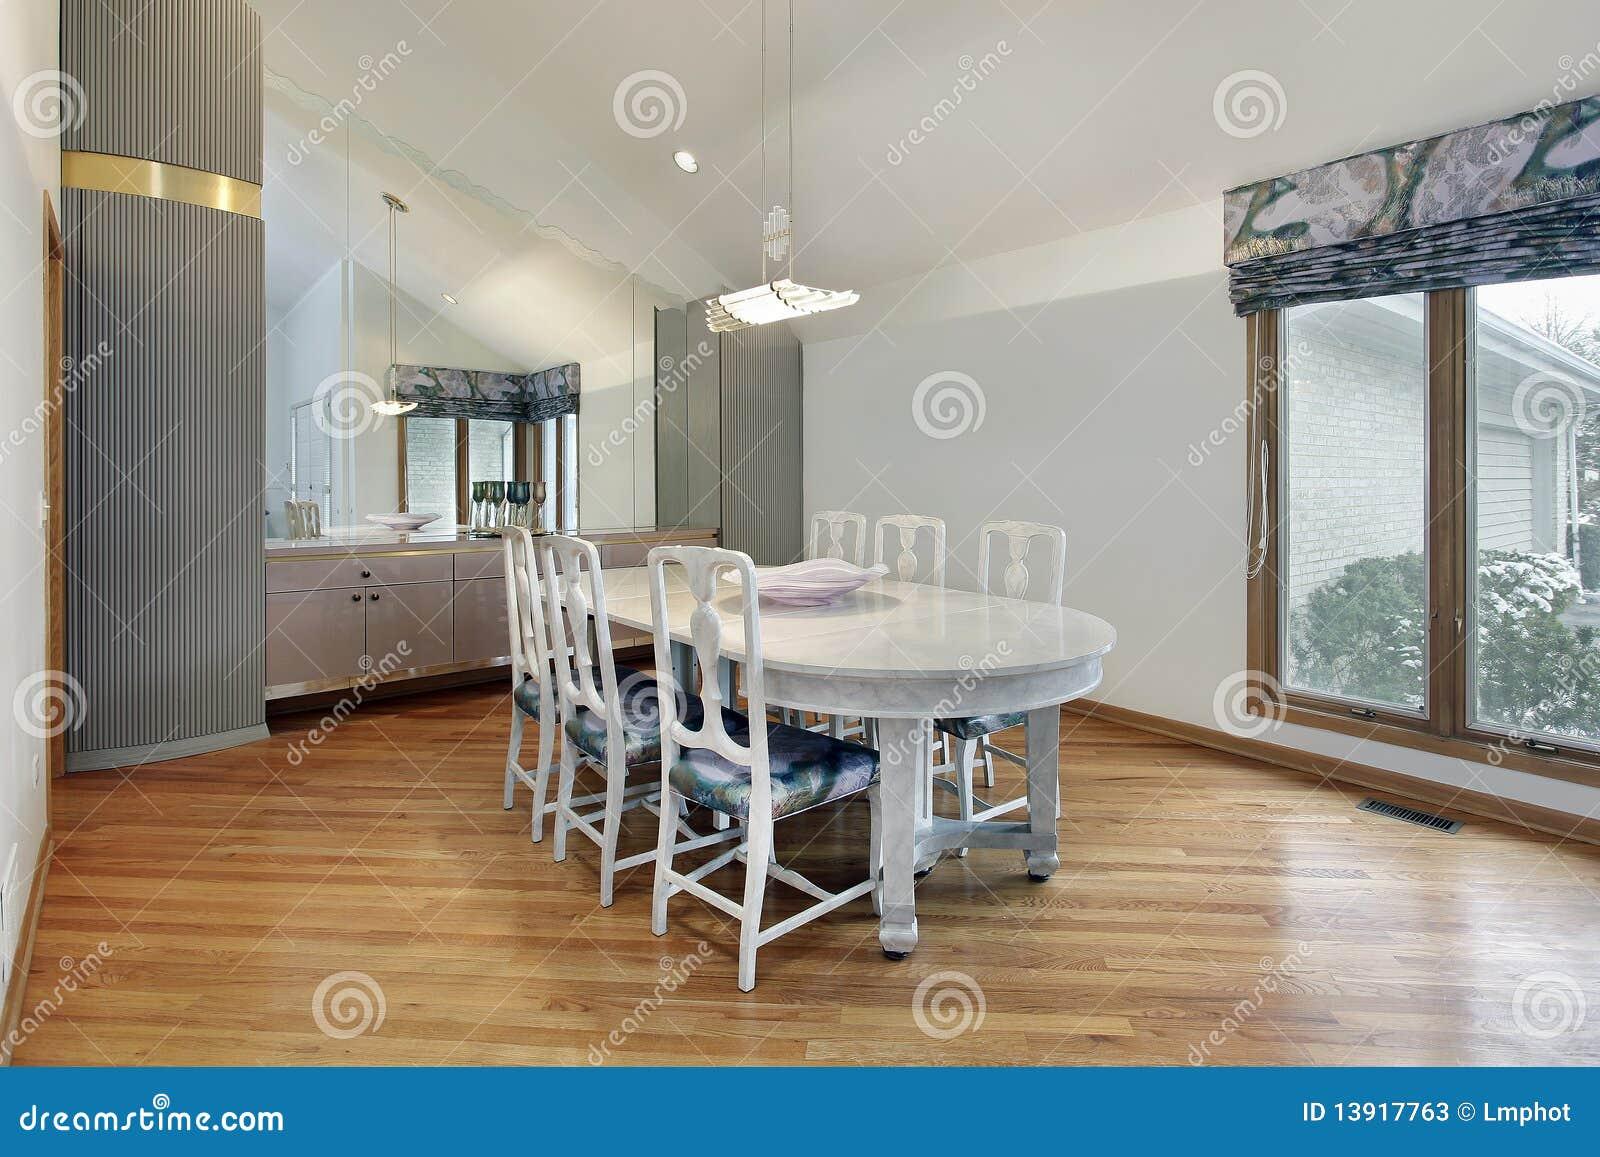 Sala da pranzo classica 25 idee per arredare con gustoof sala da pranzo traduzione inglese - Quadri per sala da pranzo ...